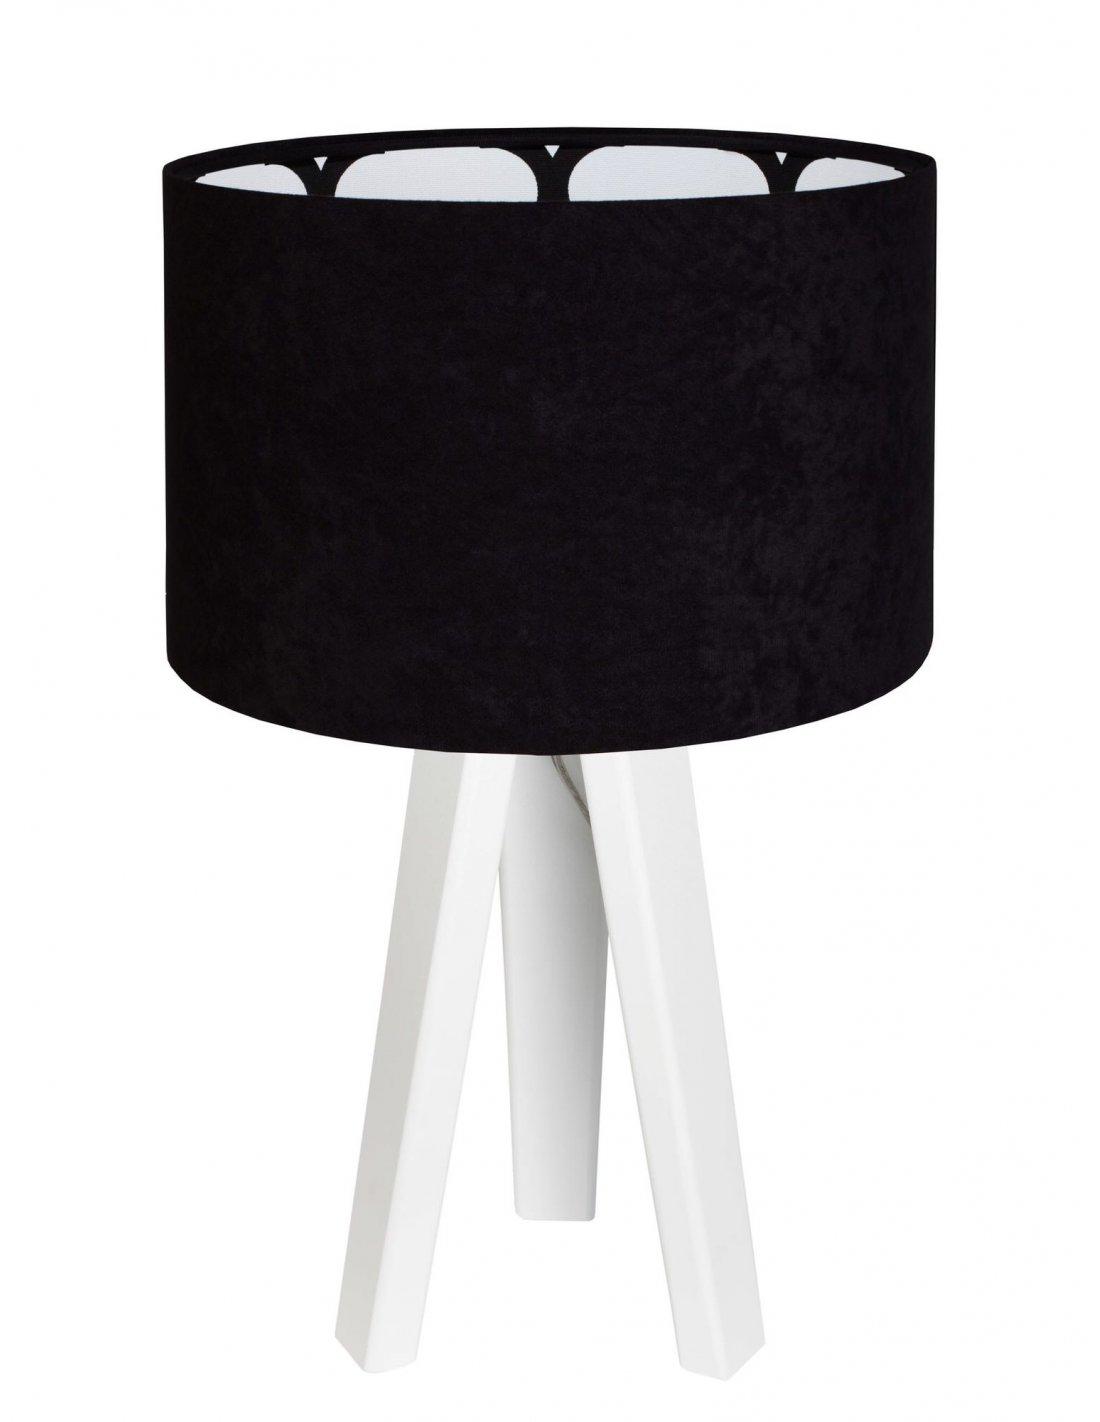 Chevet Velour IntérieurBps Lampe Modern Koncept Motif Avec De Noir If6mgyb7vY